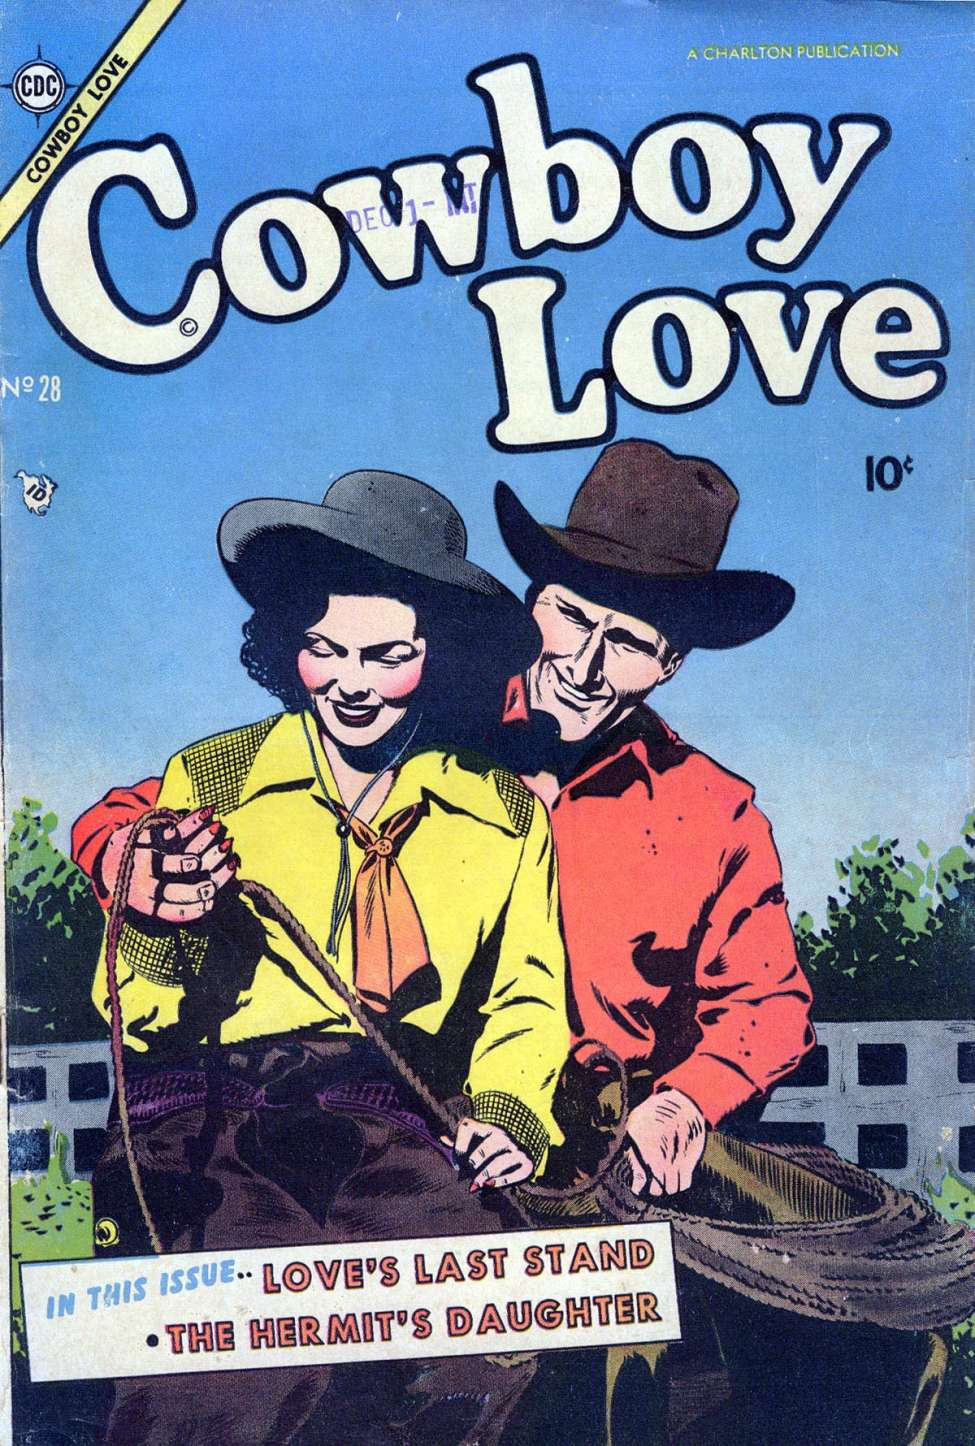 Cowboy Love Vol 1 28